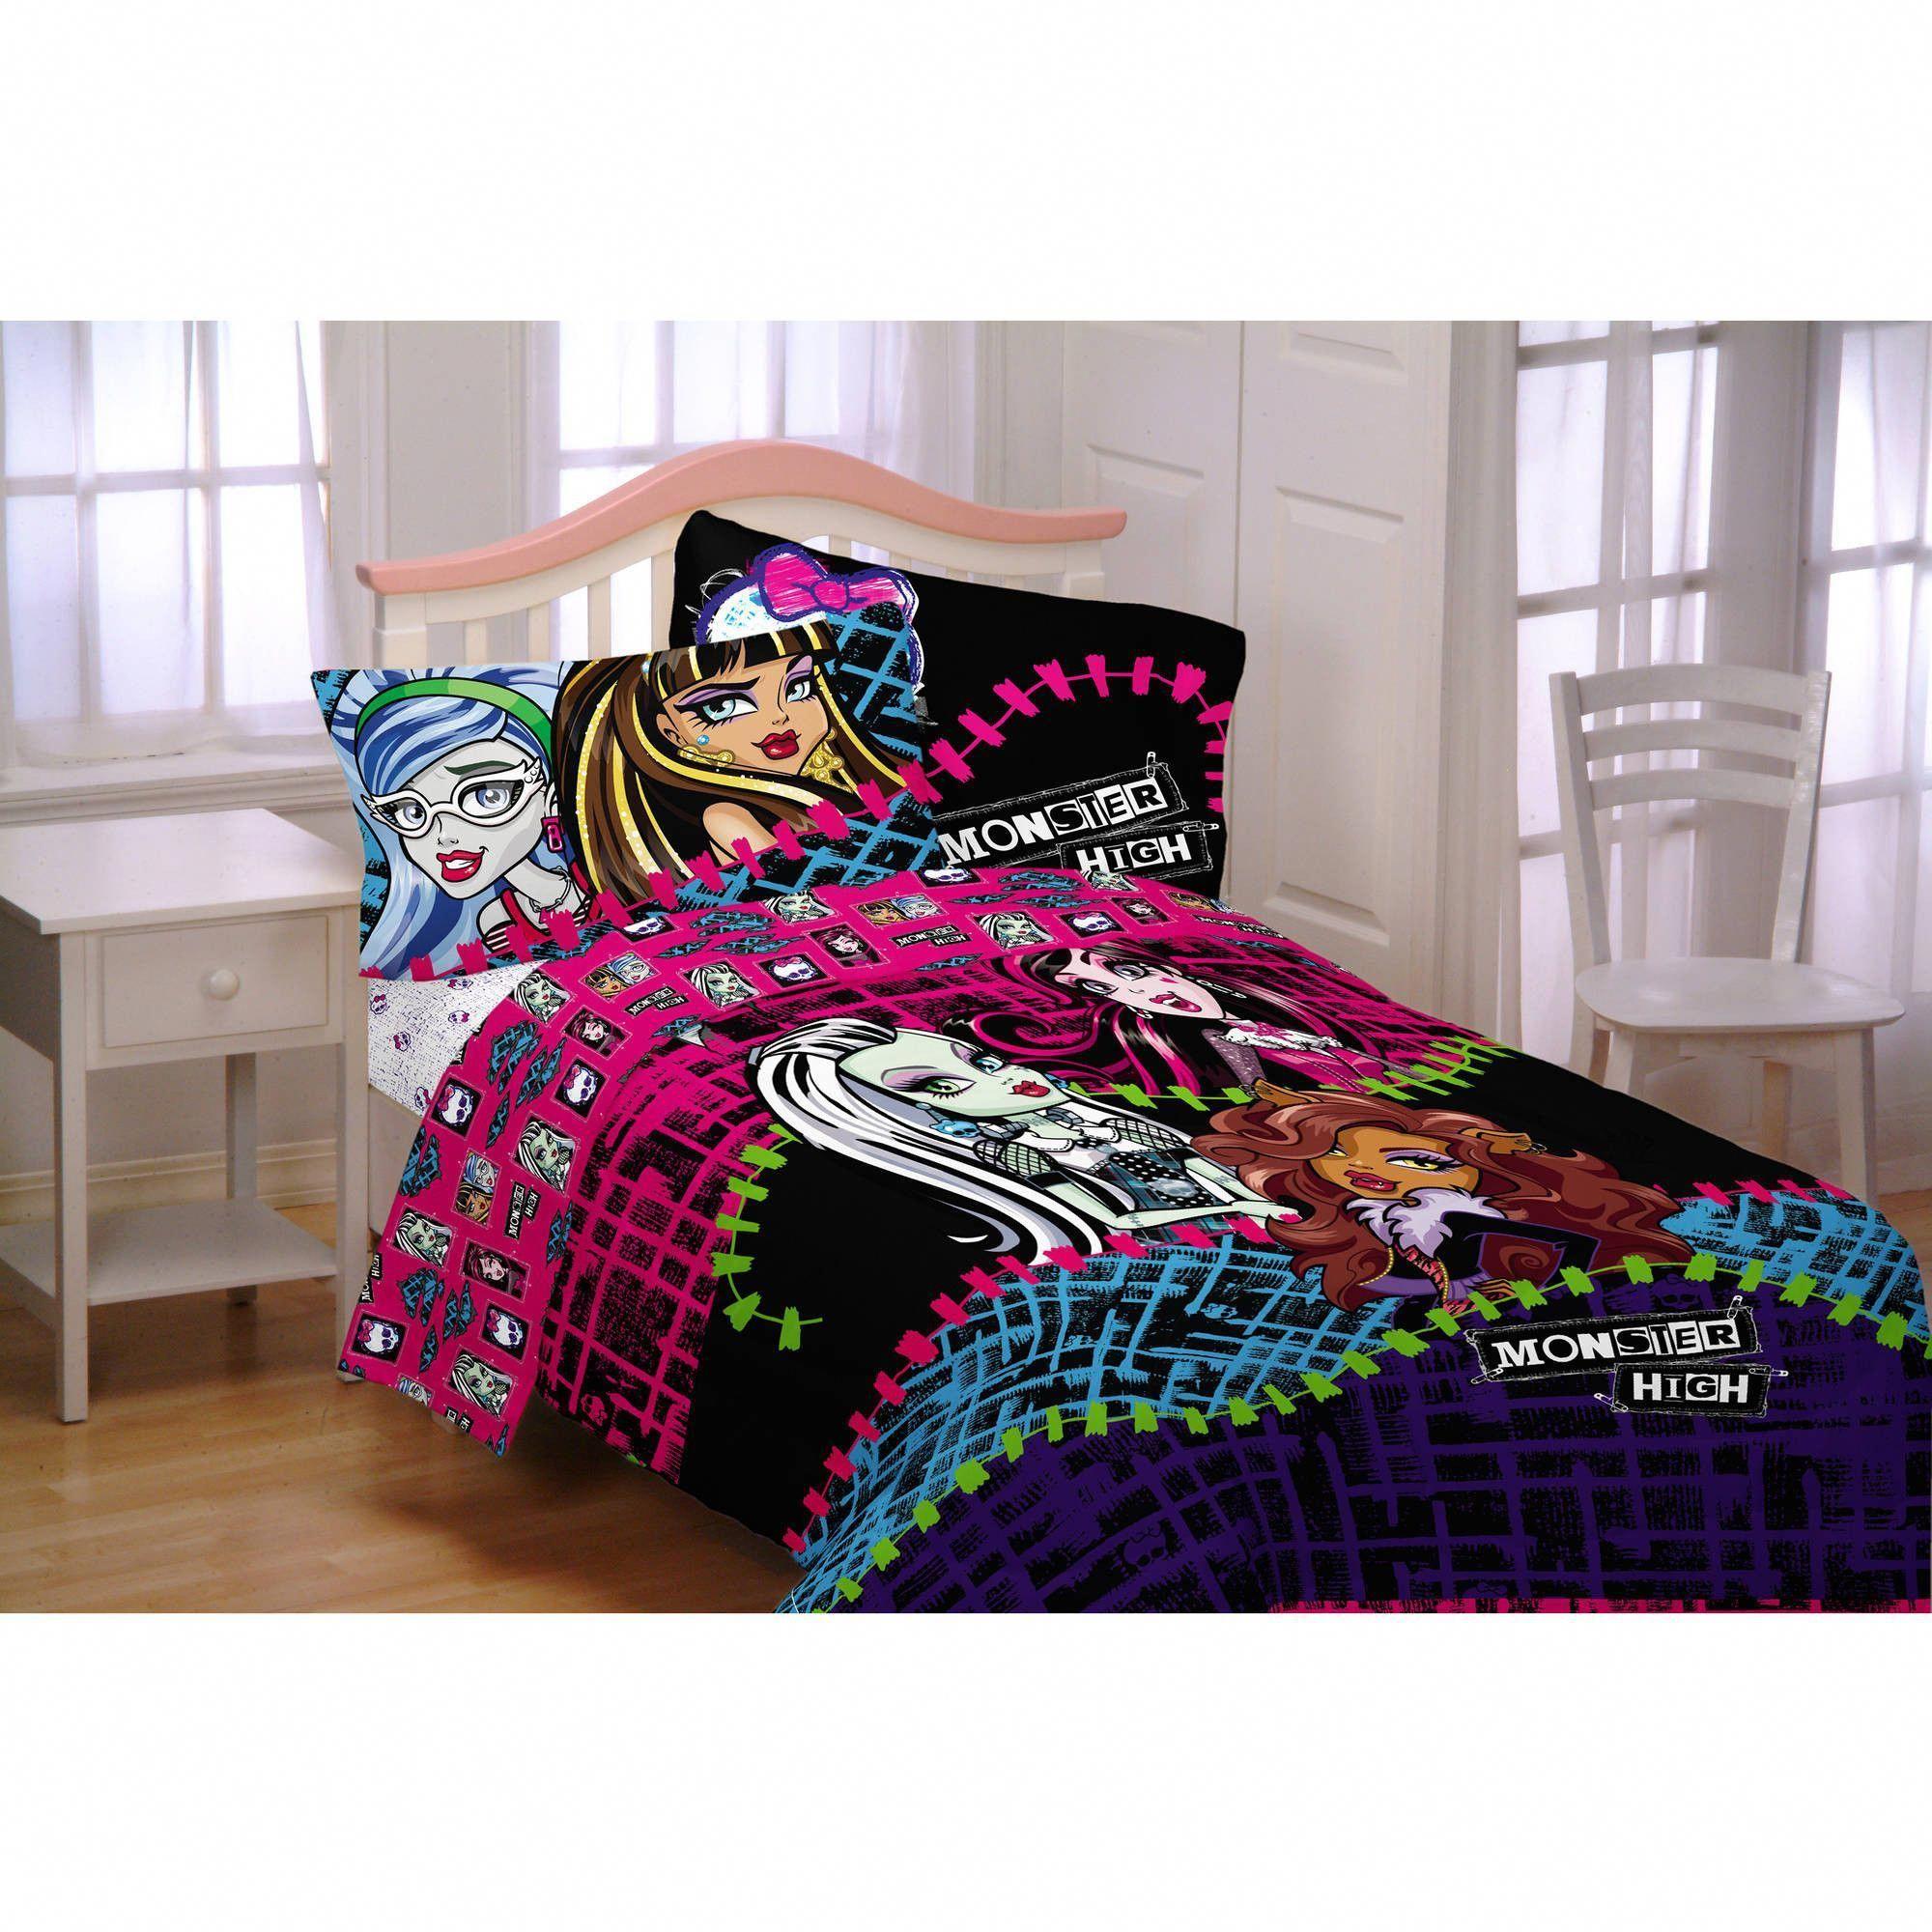 Kids,Toddlers, Teens Twin Size Bedding Comforter Set Turn